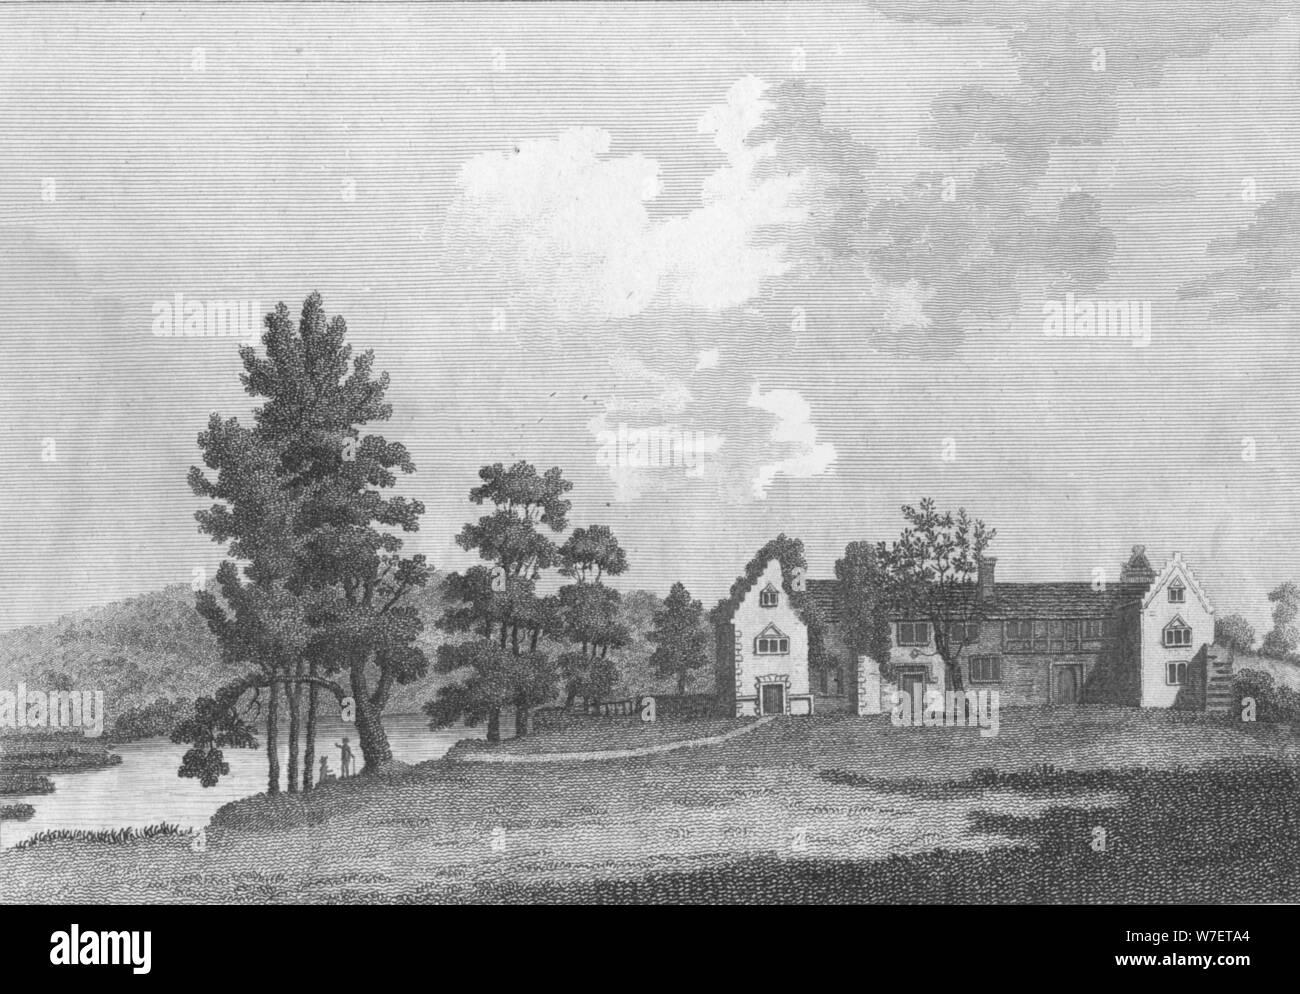 'Medmenham Abbey near Henley on Thames', 1787. Artist: J Newton. Stock Photo